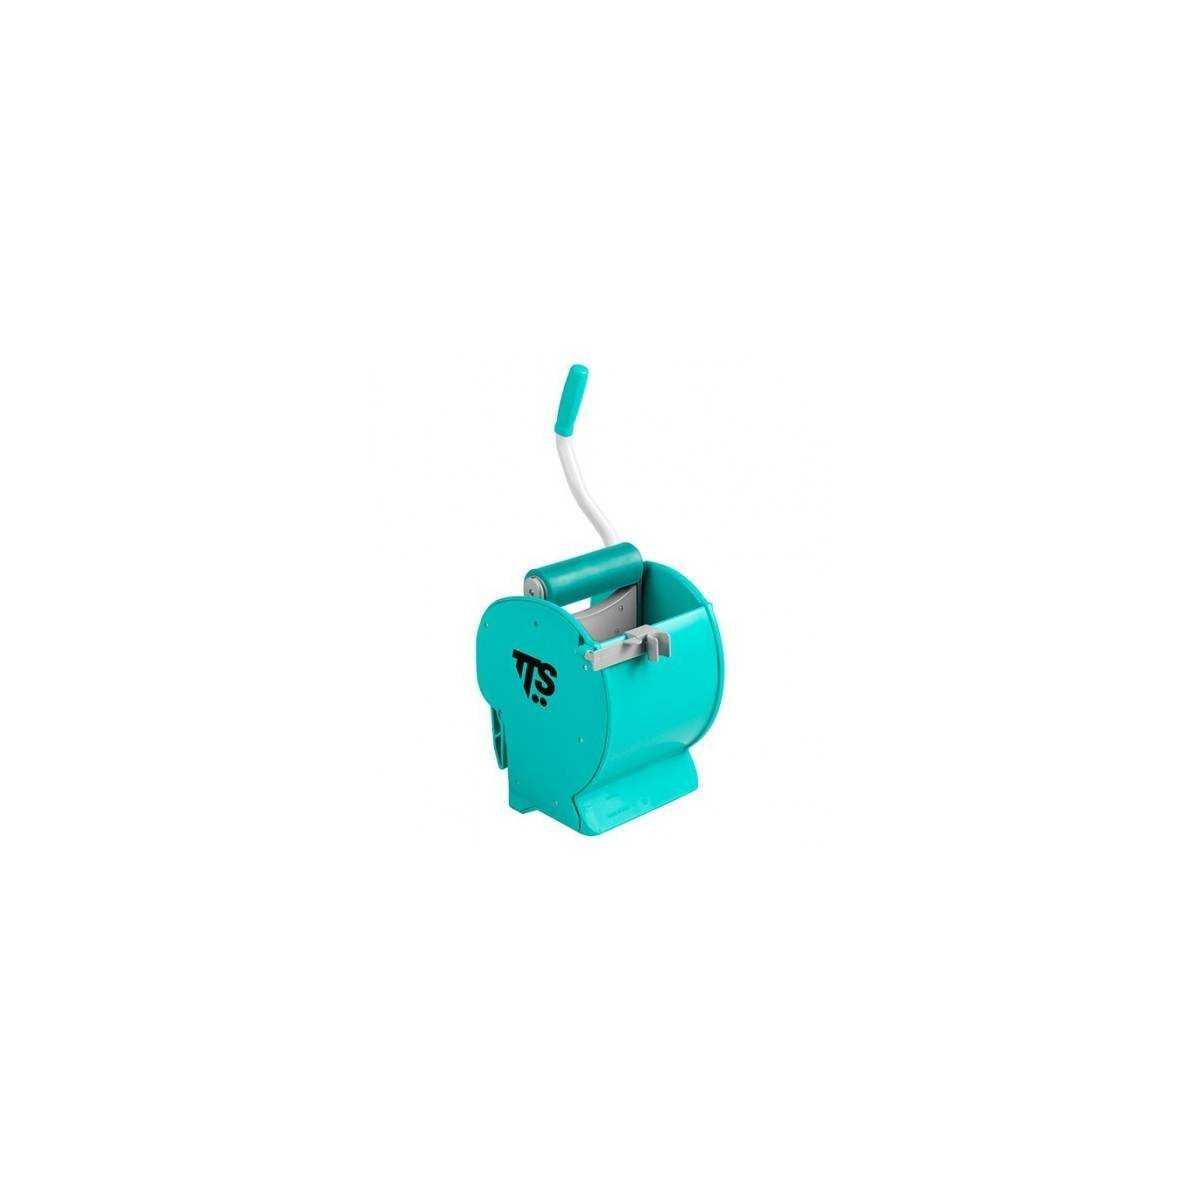 Отжим Dry (Зеленого цвета) 00003410 TTS